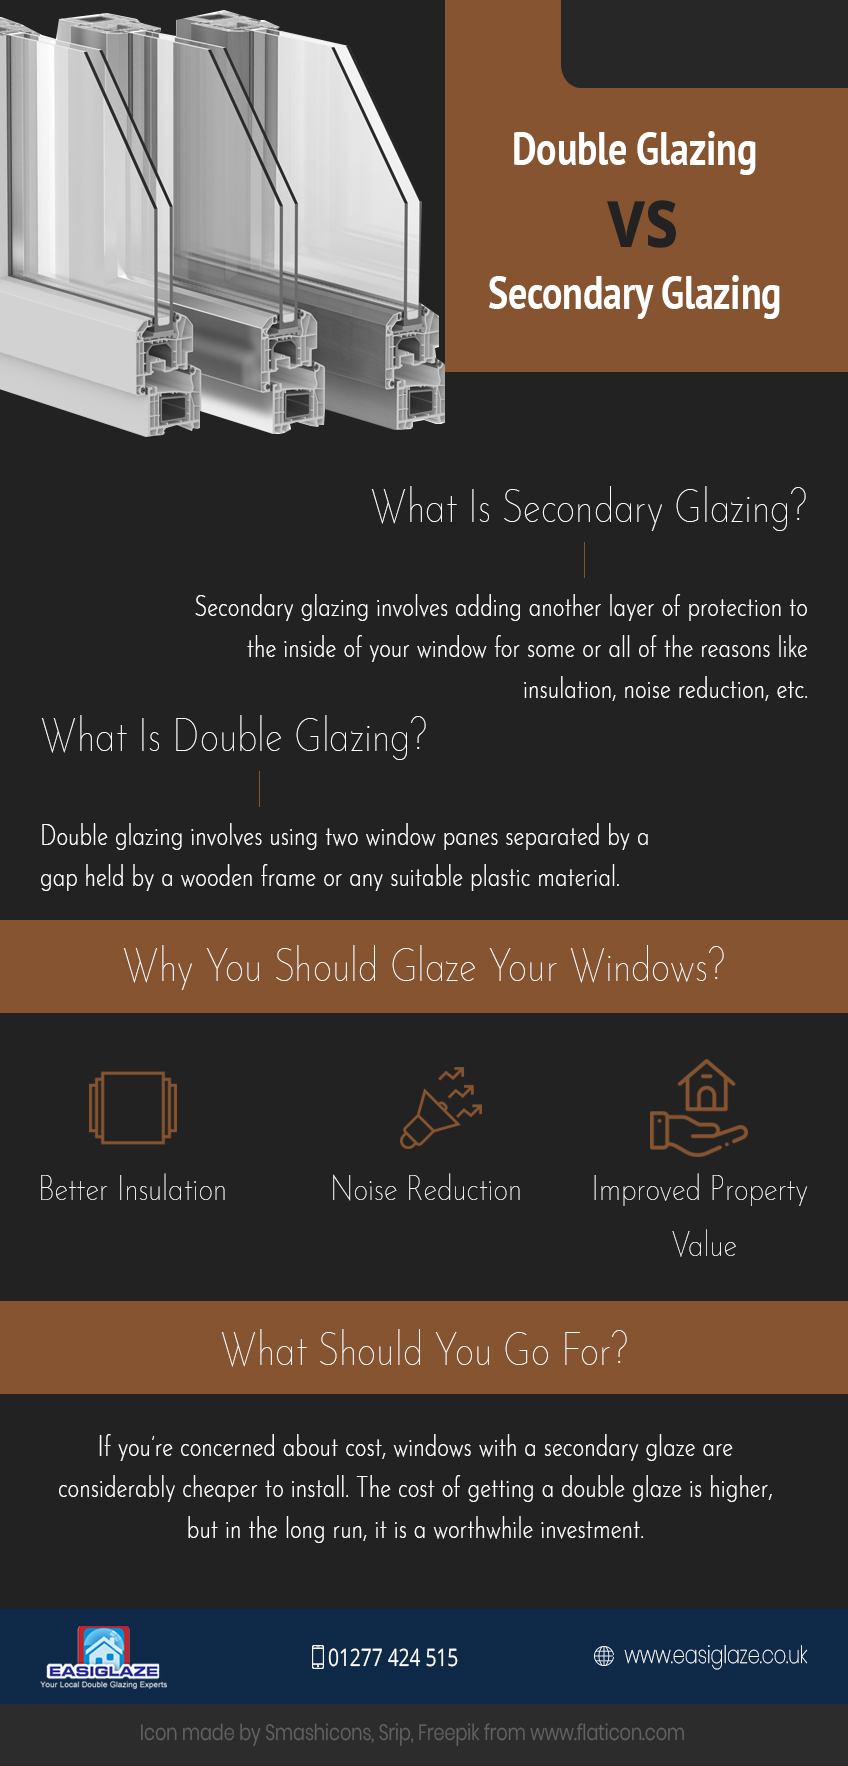 Double-Glazing-vs-Secondary-Glazing infographic